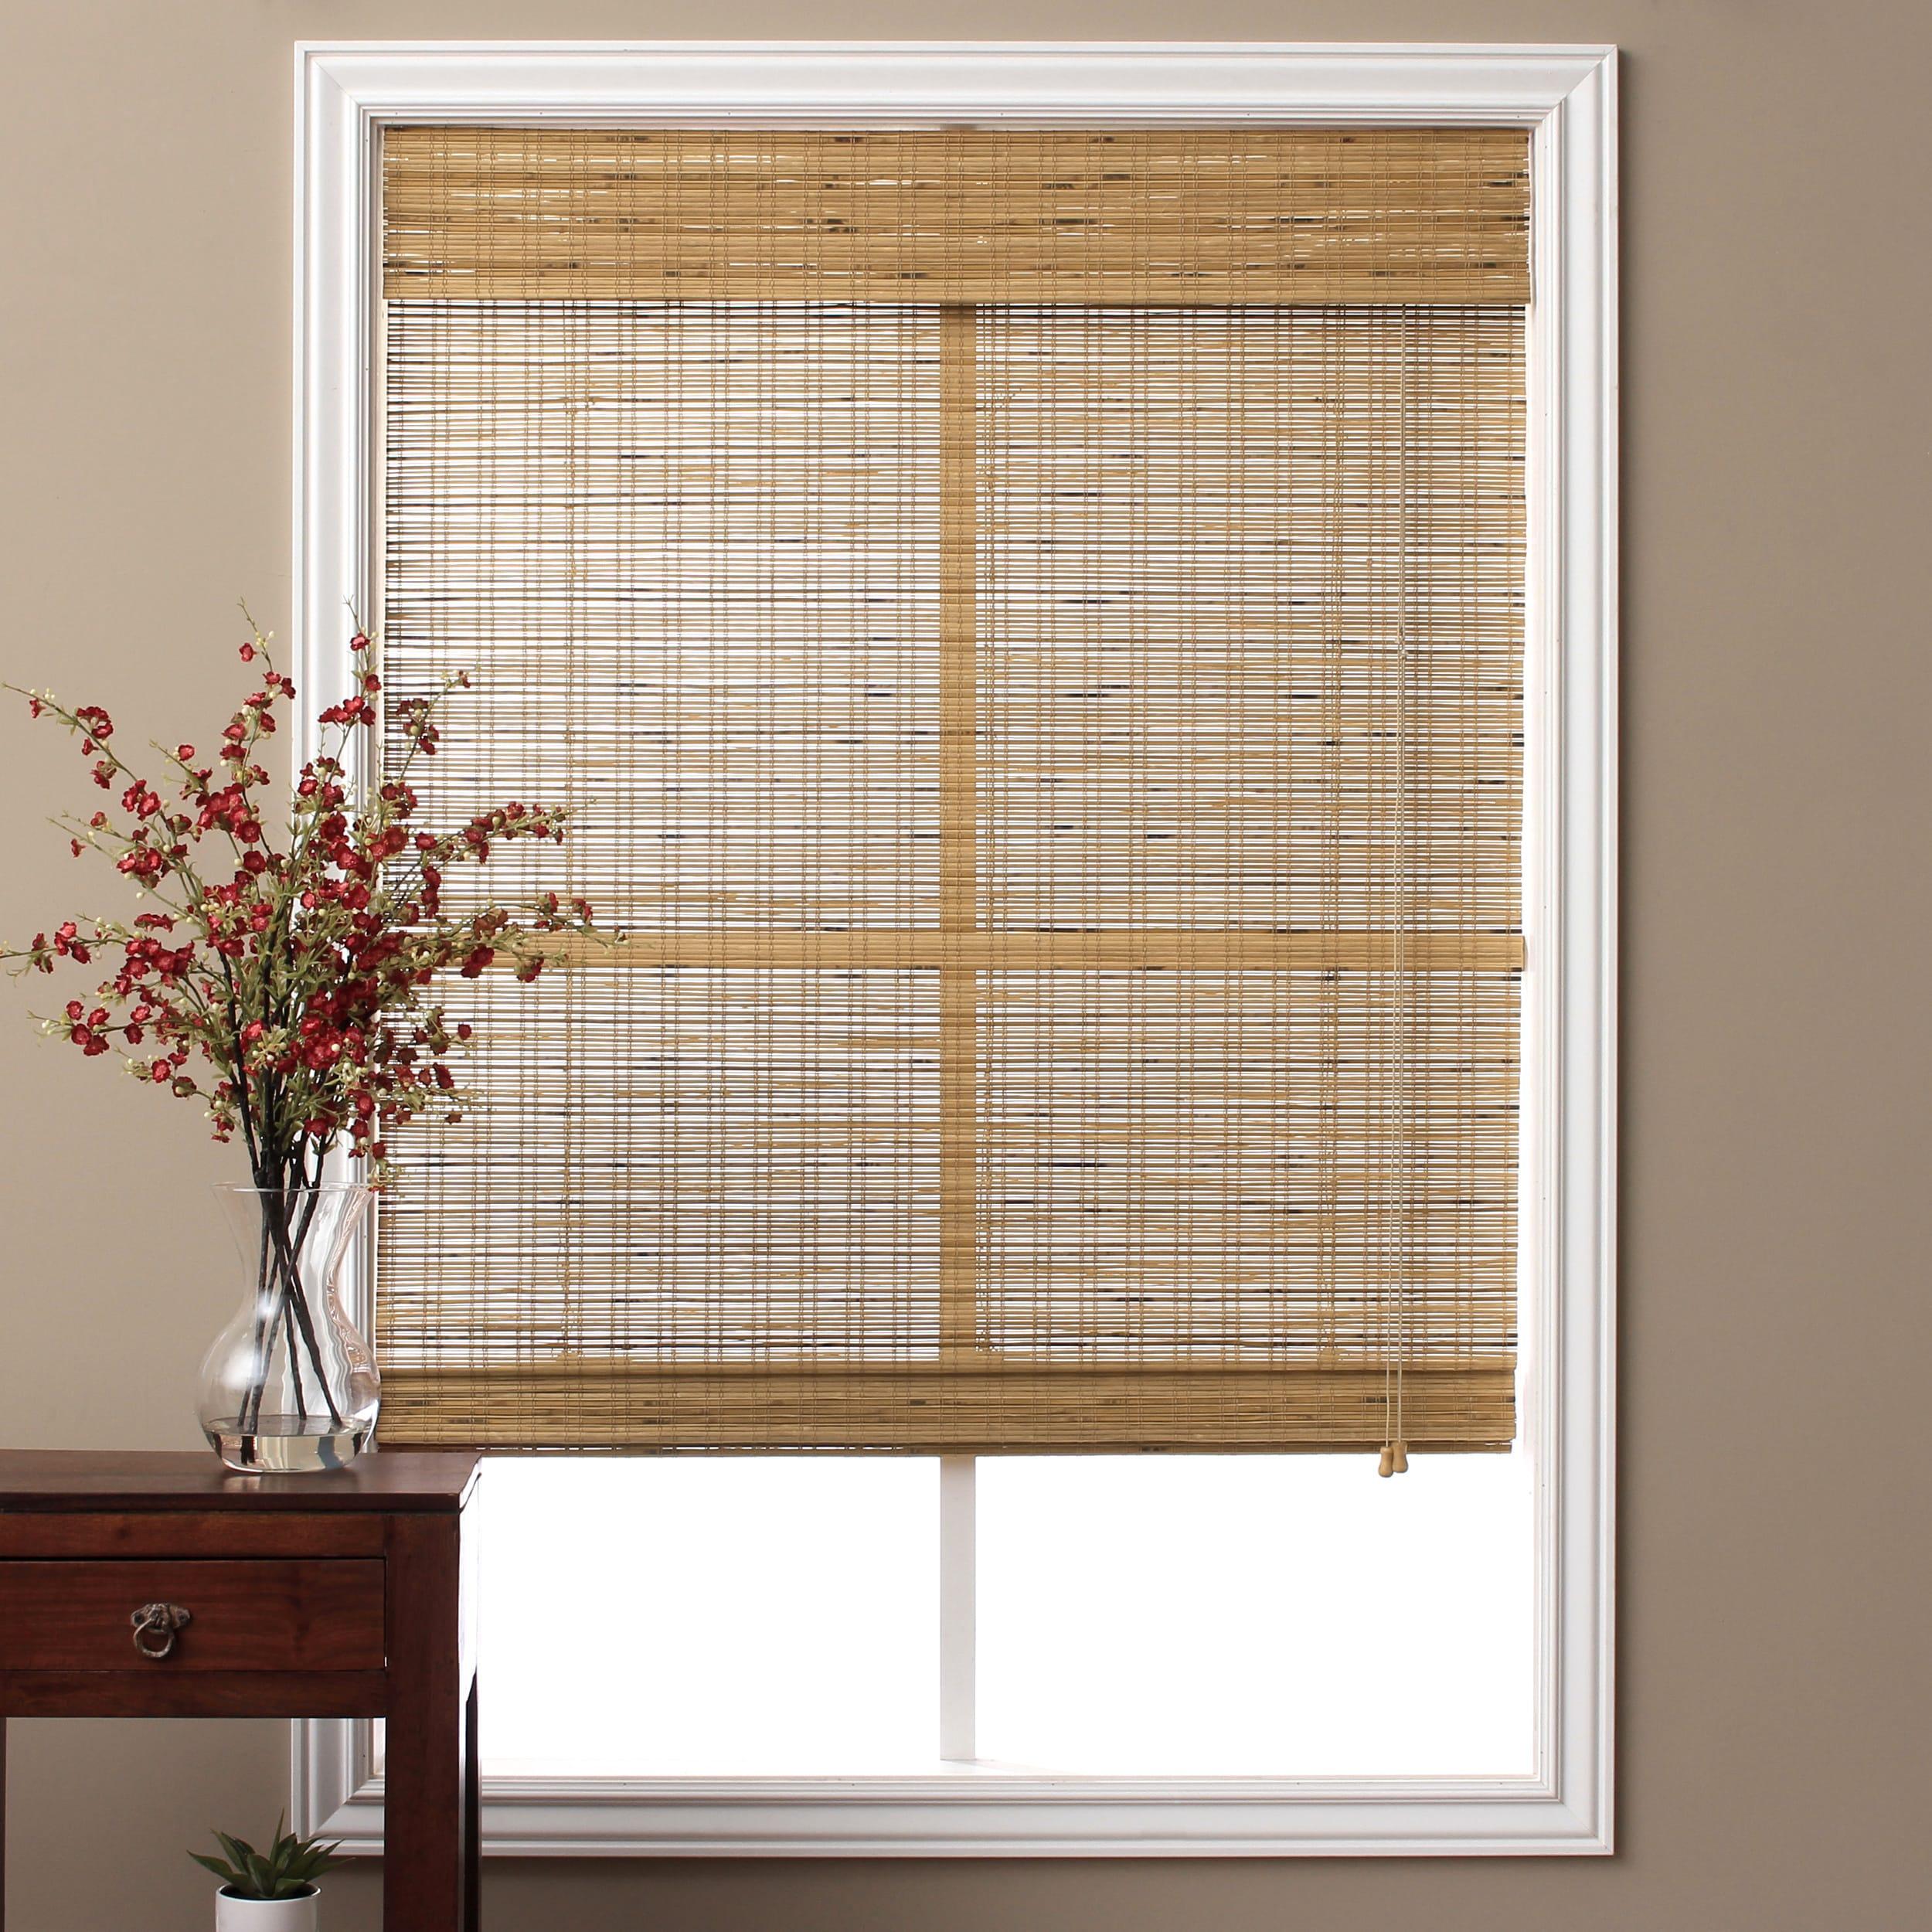 Bamboo Roman Shades Window Blinds Curtain Roll Light Filter Tuscan Home Decor